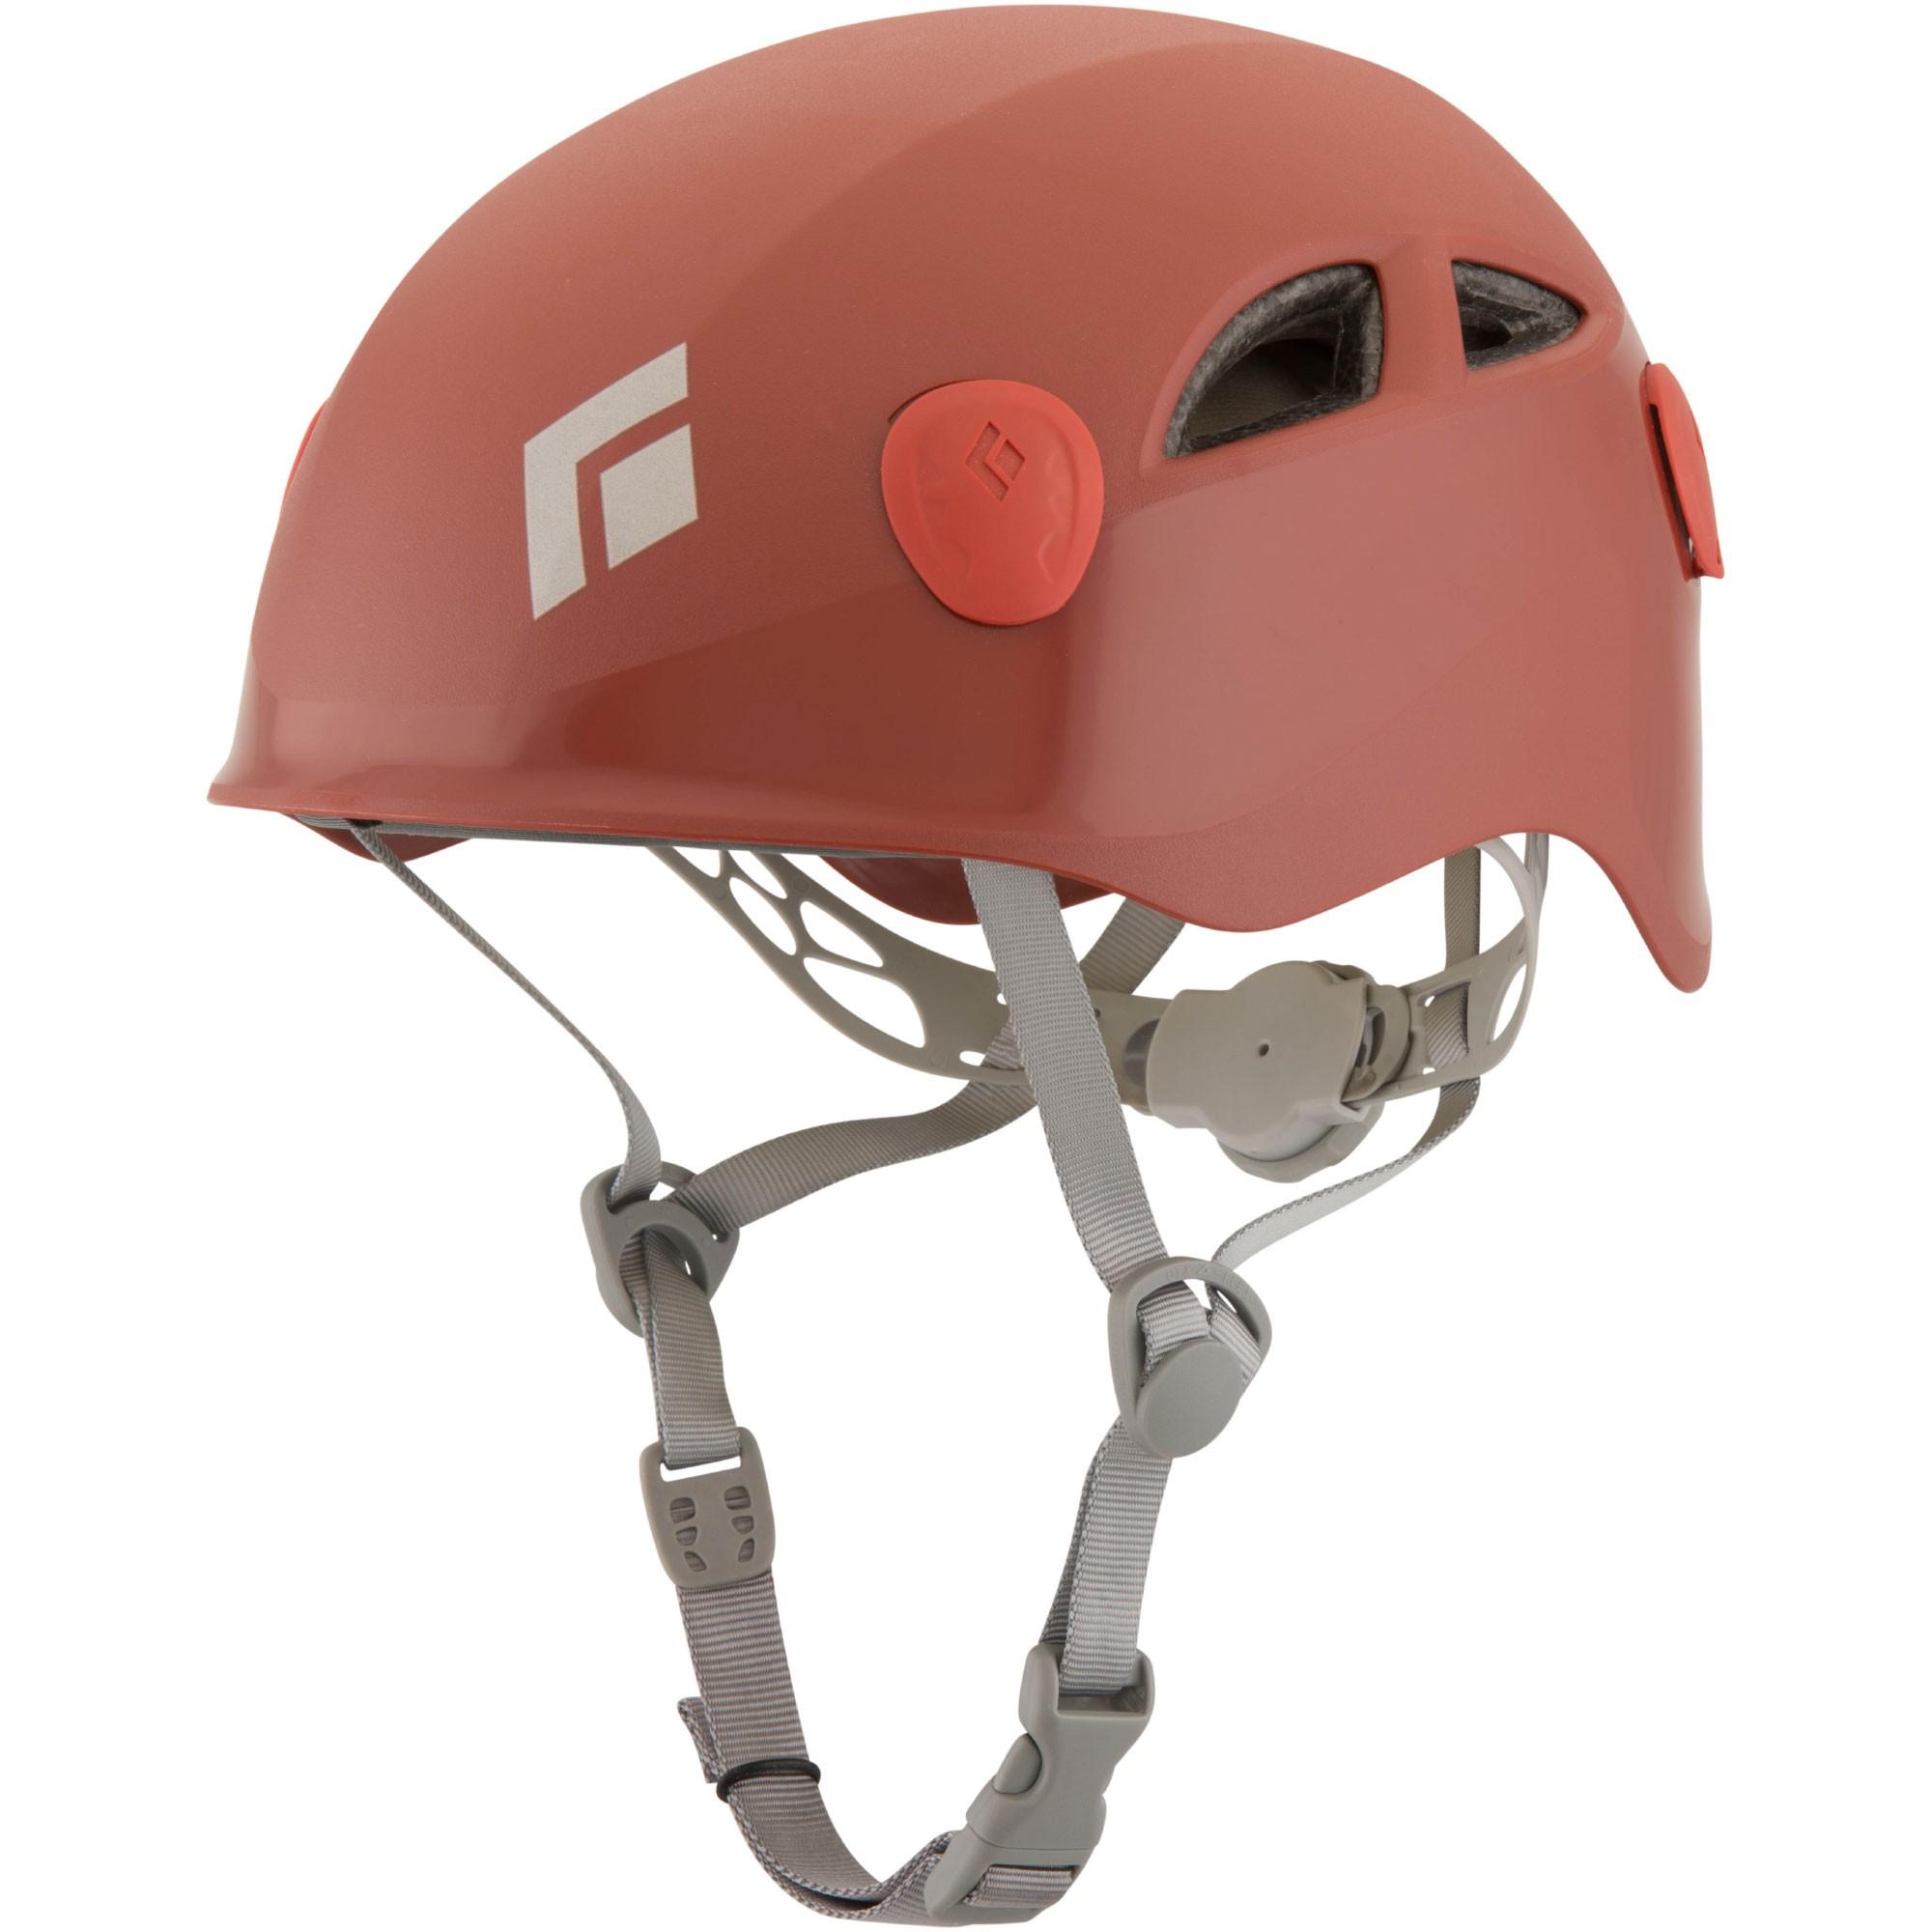 BLACK DIAMOND - Half Dome Helmet - Deep Torch